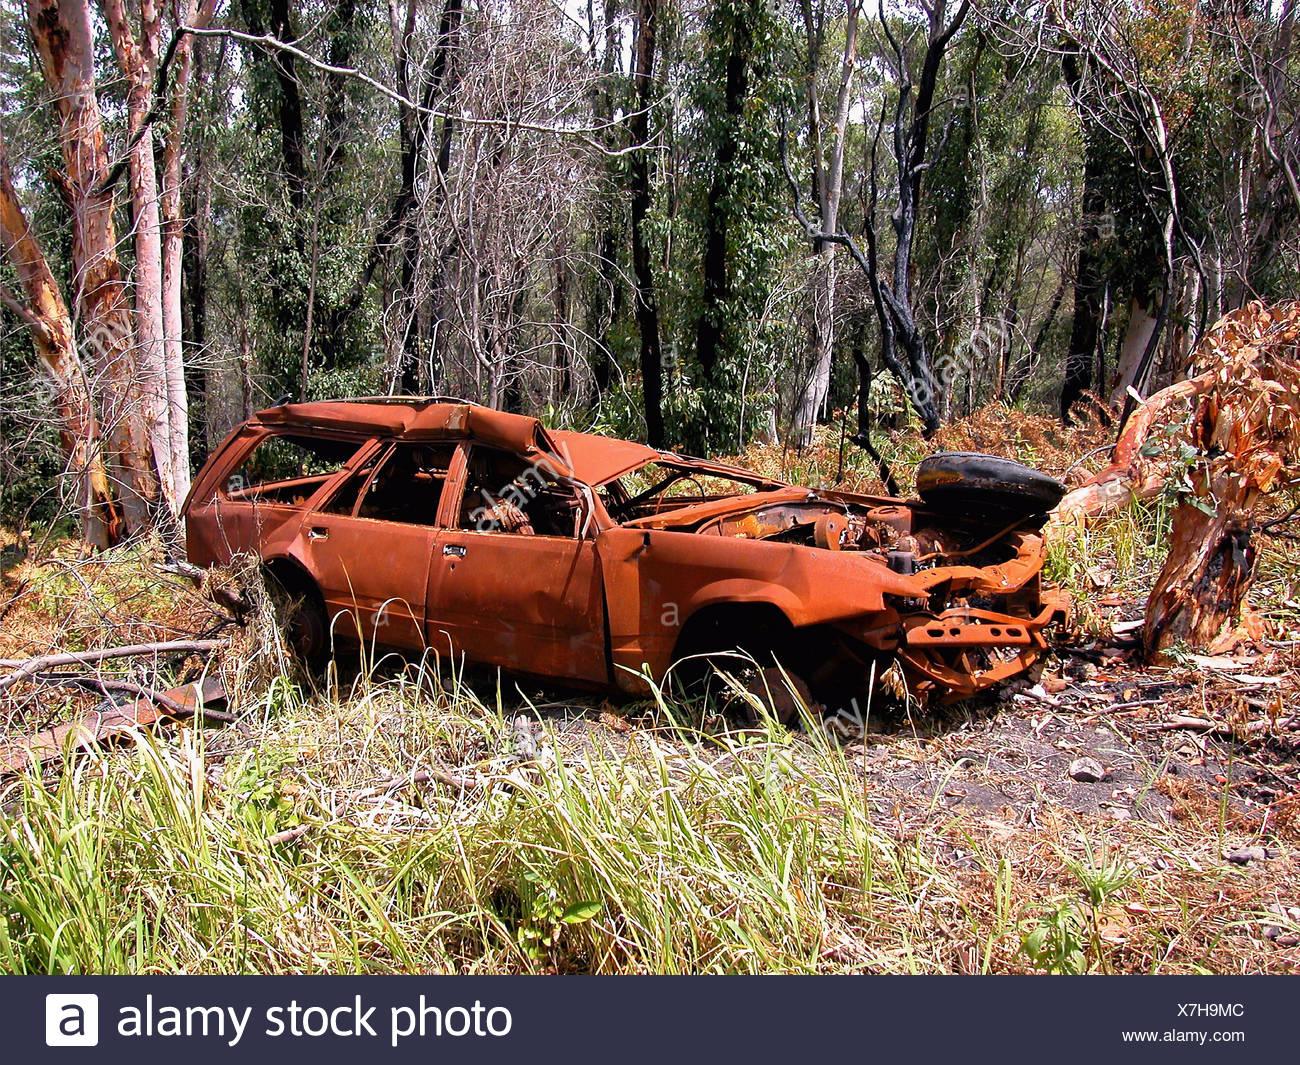 wreck scrap vehicle rust Stolen assurance insurance vandalism scrap metal car automobile - Stock Image